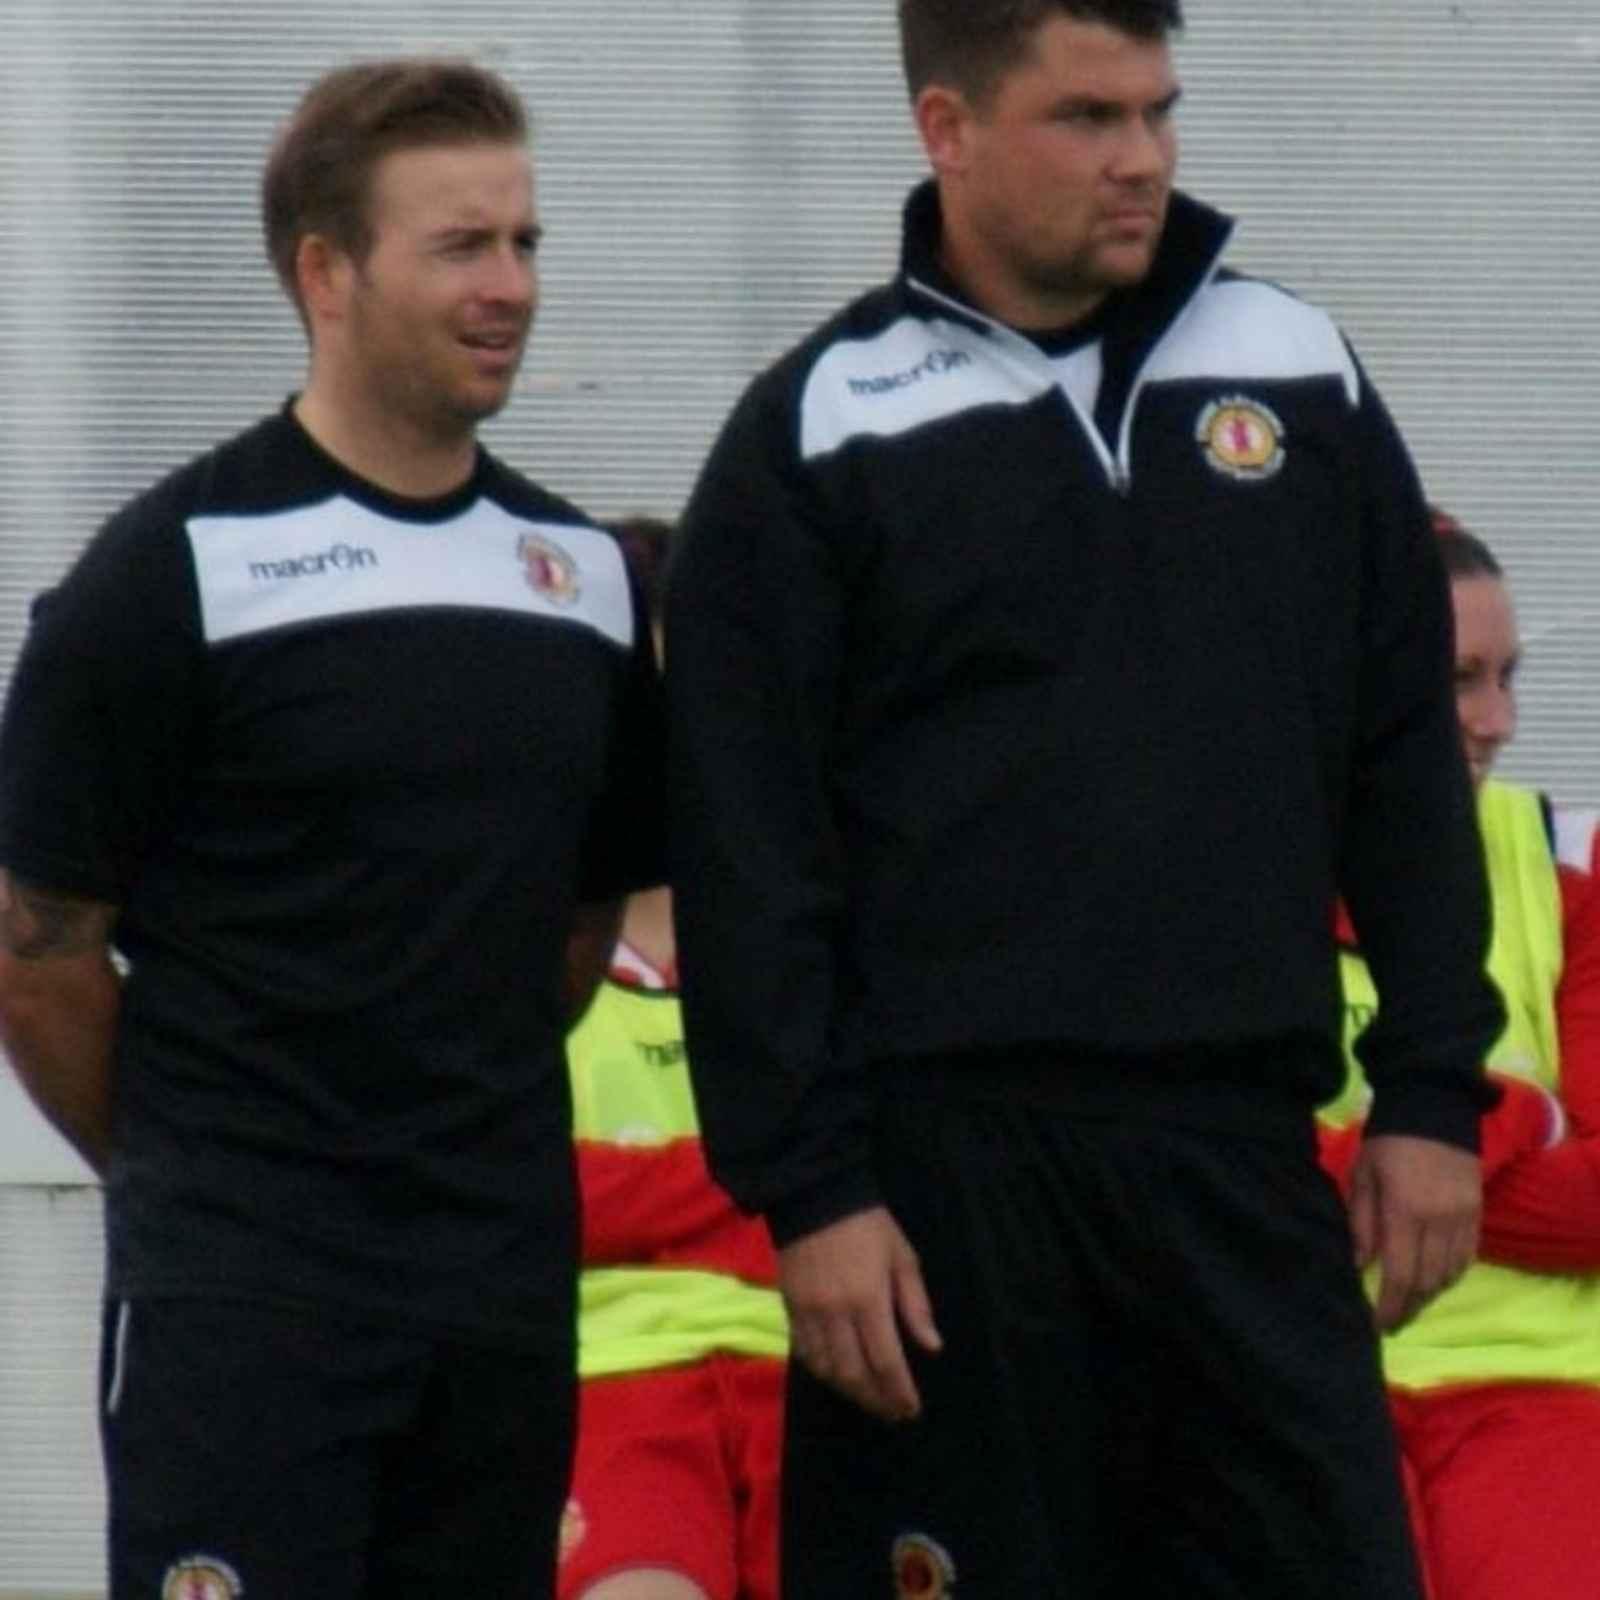 Wigan Athletic LFC 1 - 2 Crewe Alexandra LFC